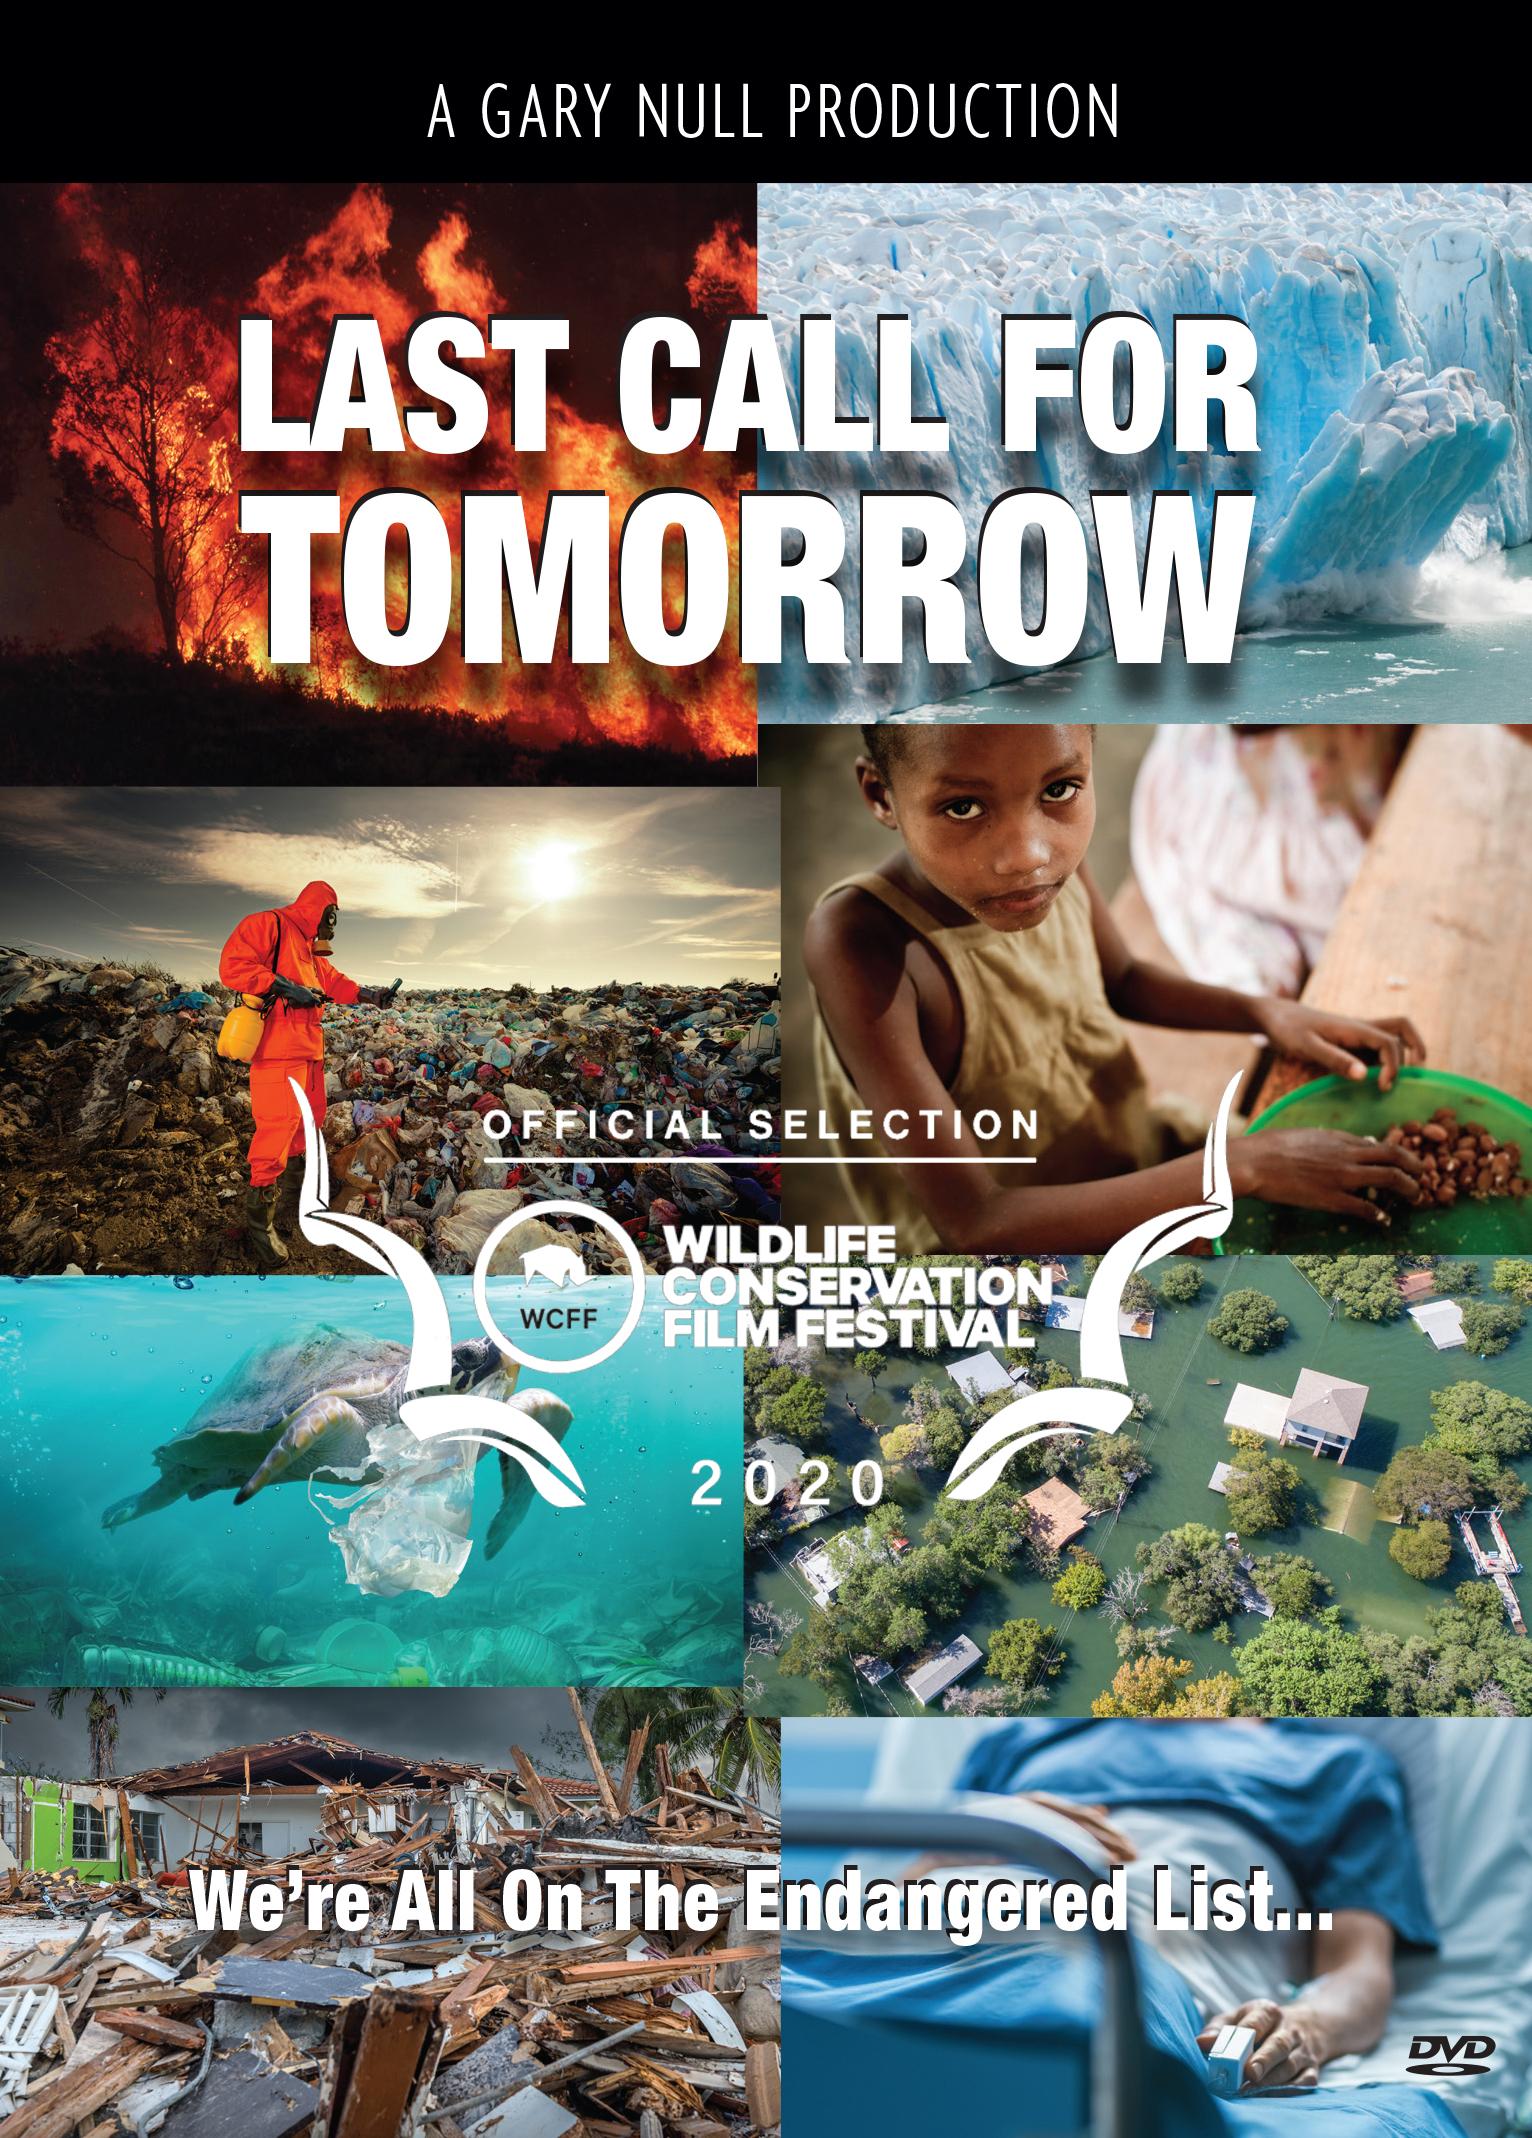 200403-Last Call for Tomorrow-DVD